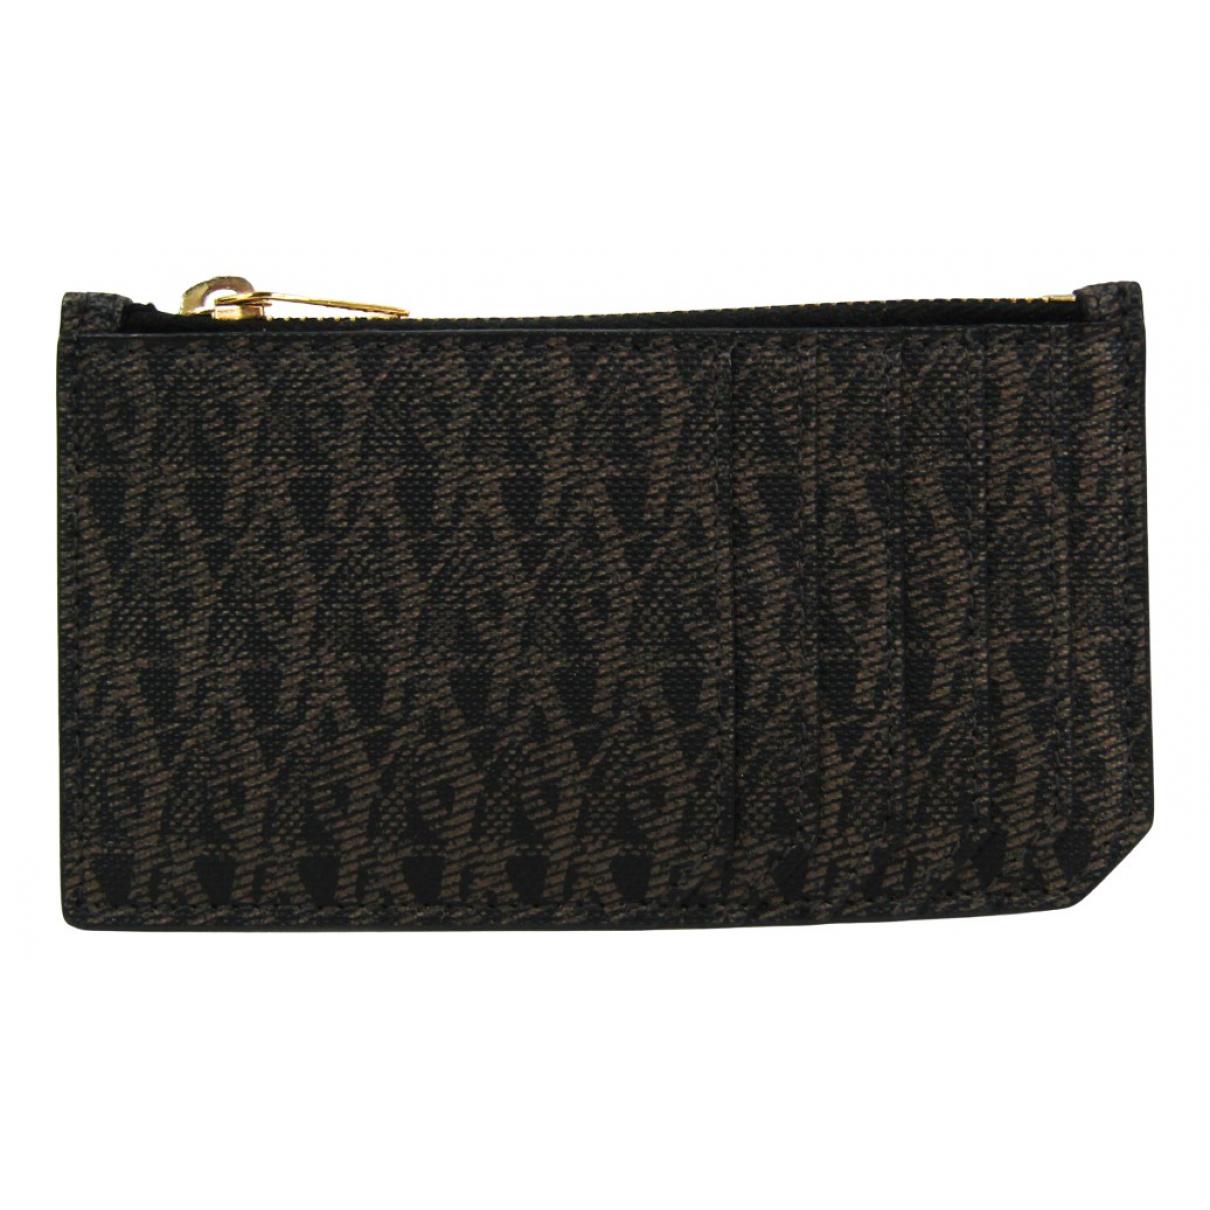 Saint Laurent N Brown Cloth Purses, wallet & cases for Women N